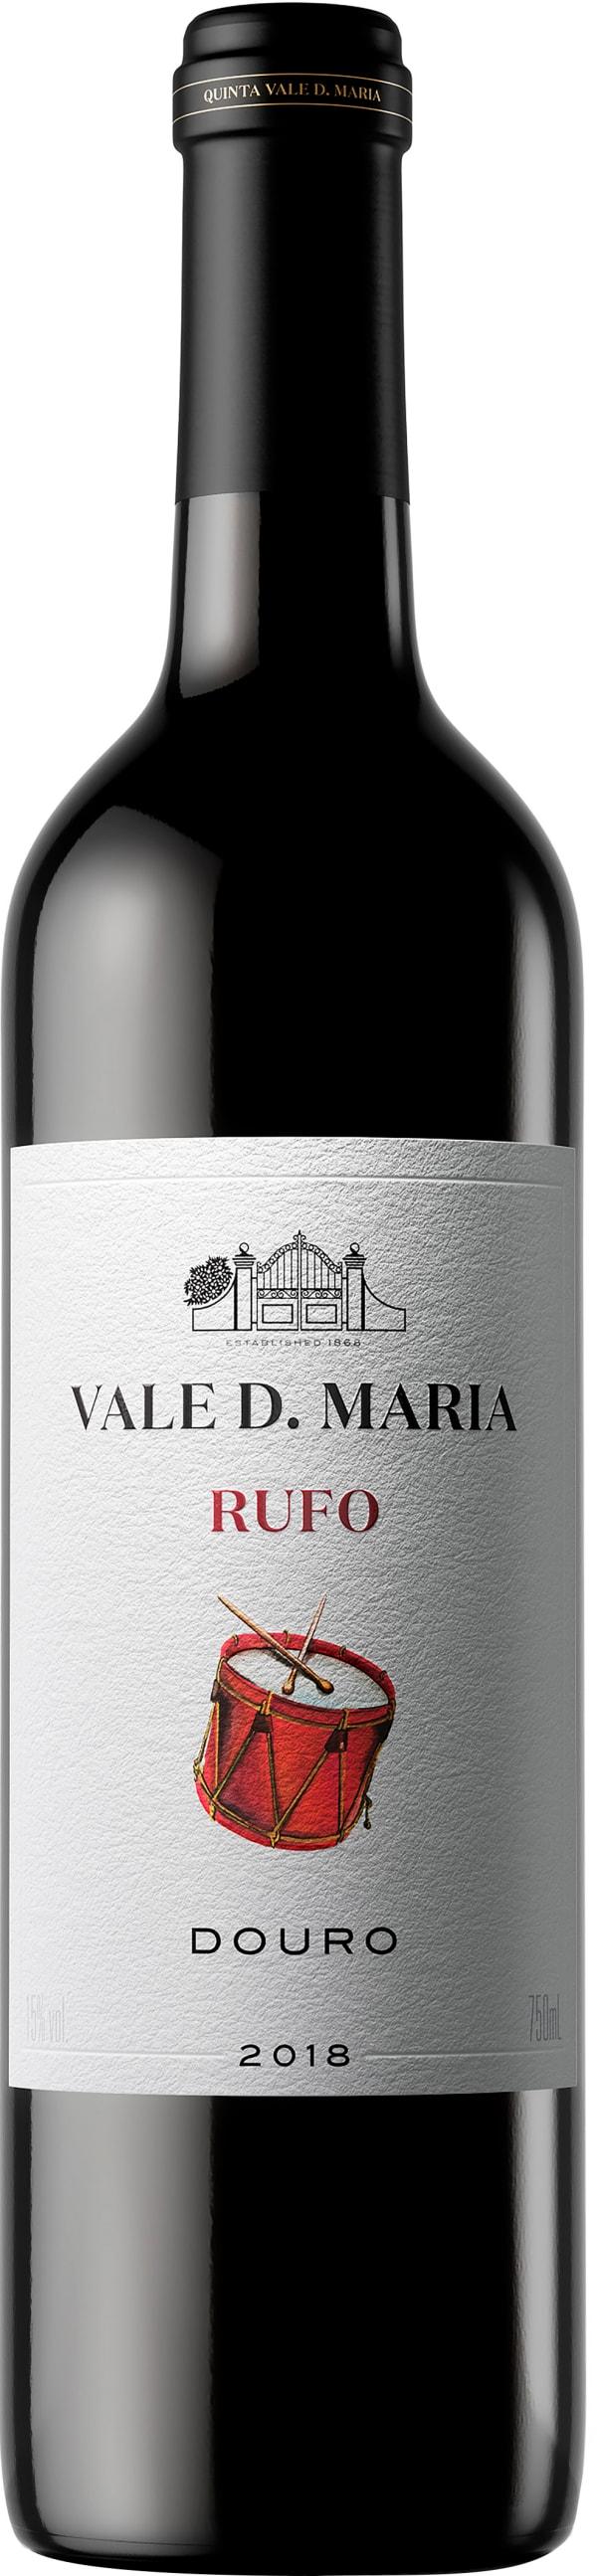 Vale D. Maria Rufo 2018